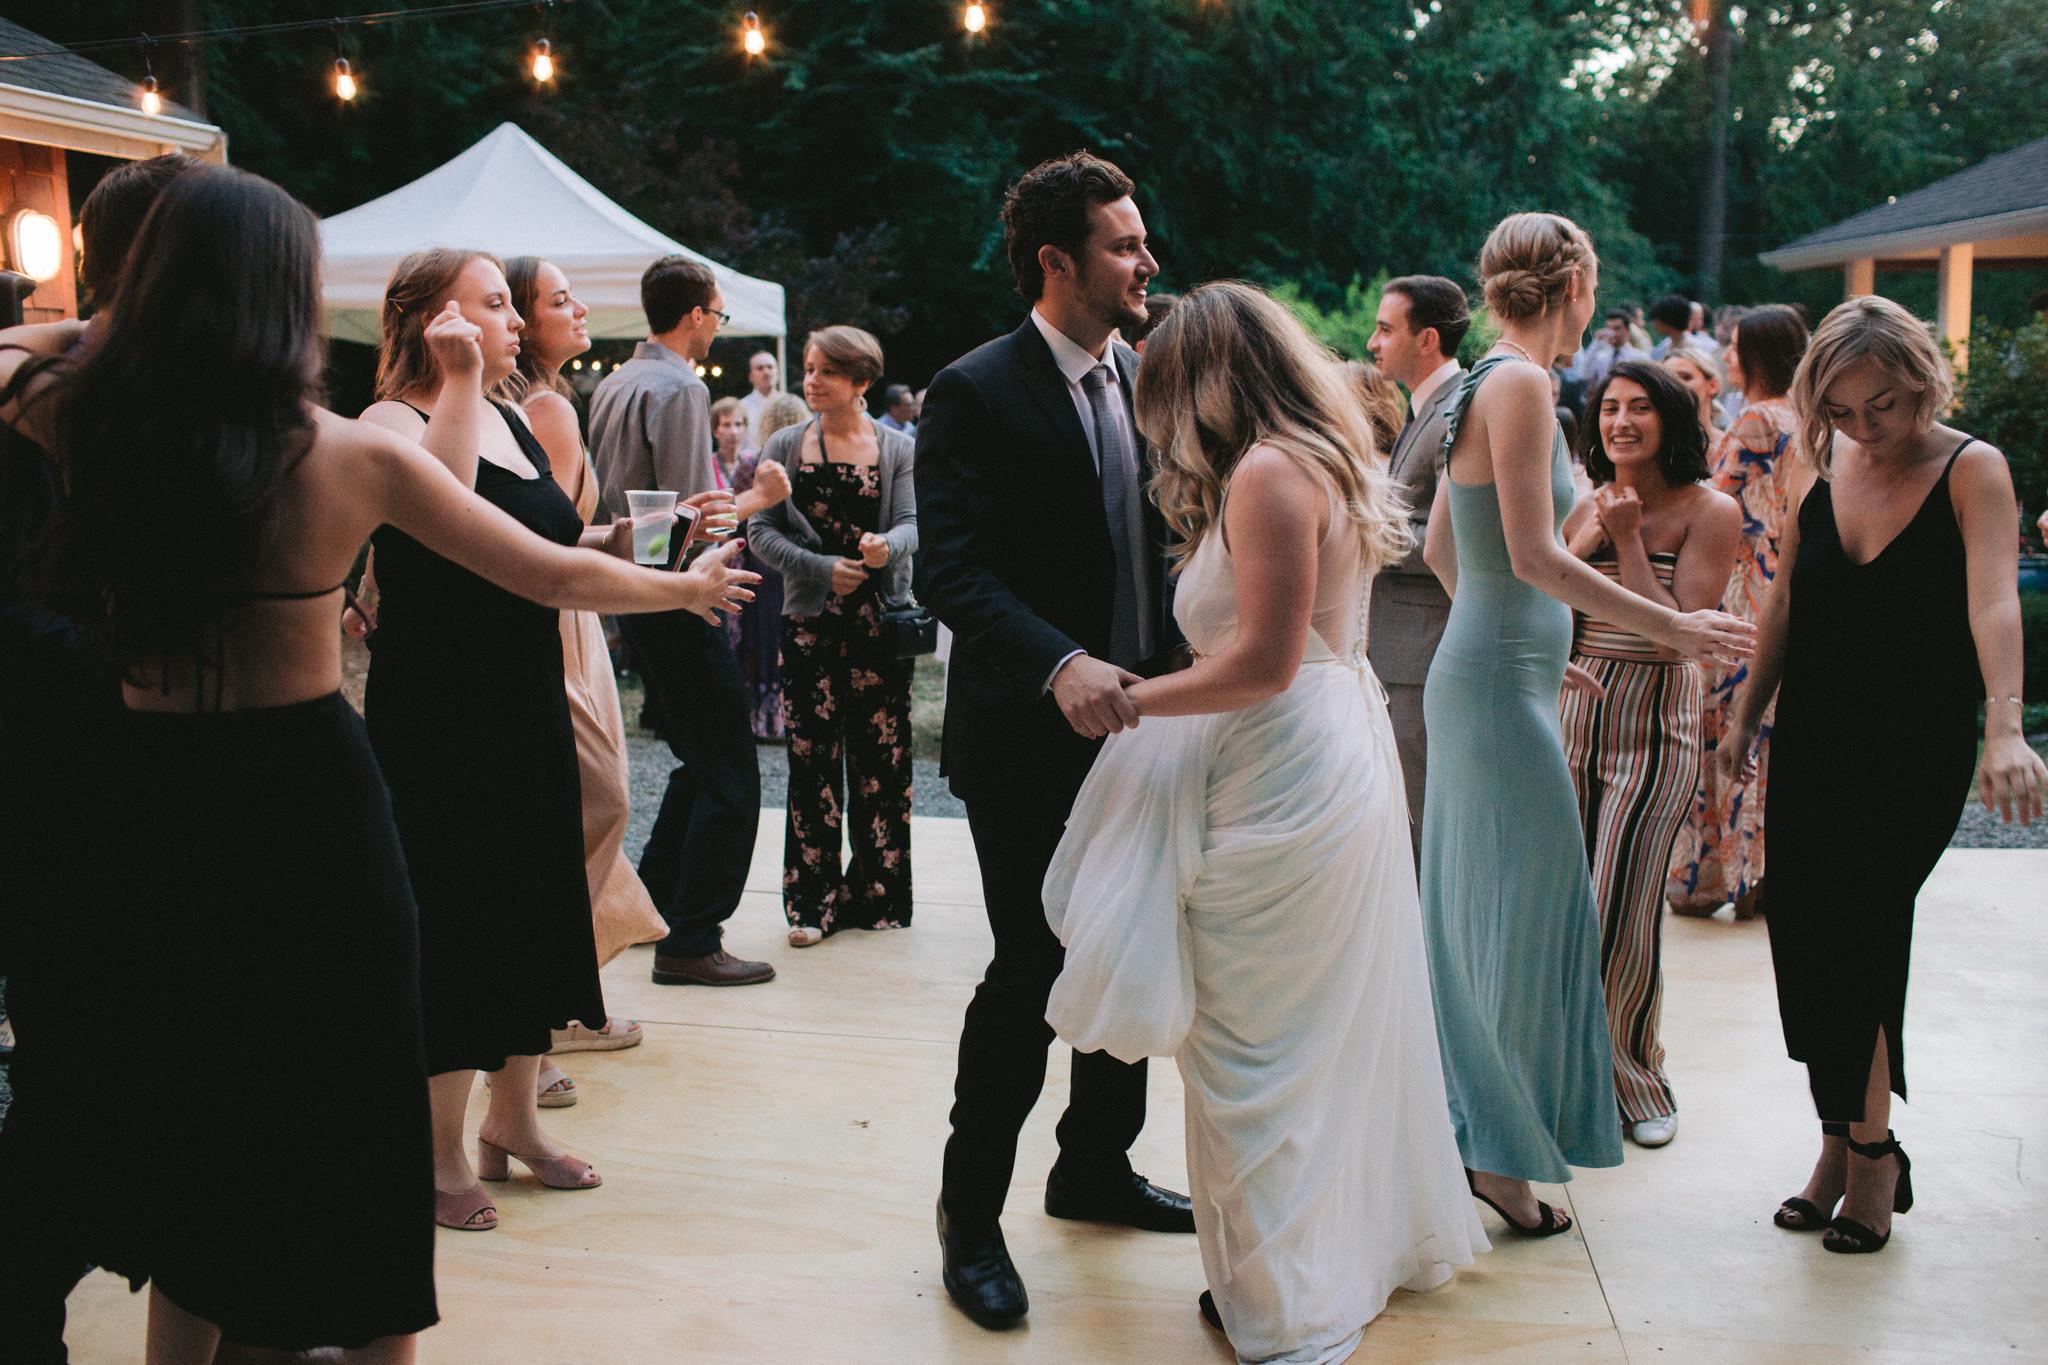 Backyard-Bainbridge-Island-Wedding-Alycia-Lovell-Photography-247.JPG